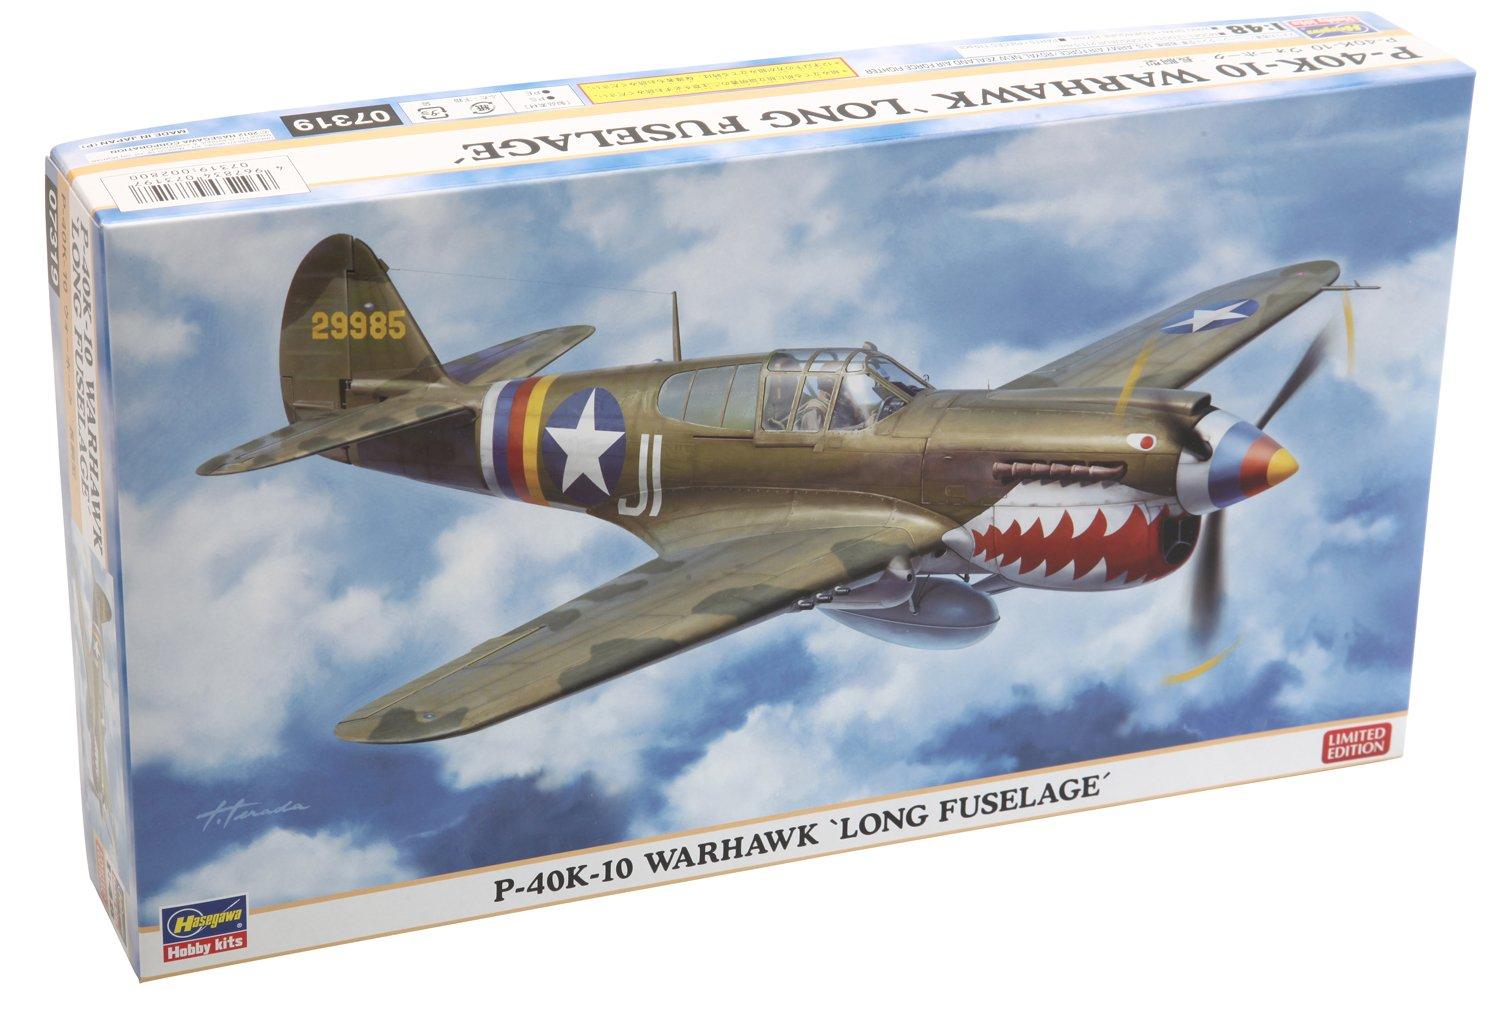 Hasegawa 07319 - 1/48 P-40K-10 Warhawk Long Fuselage